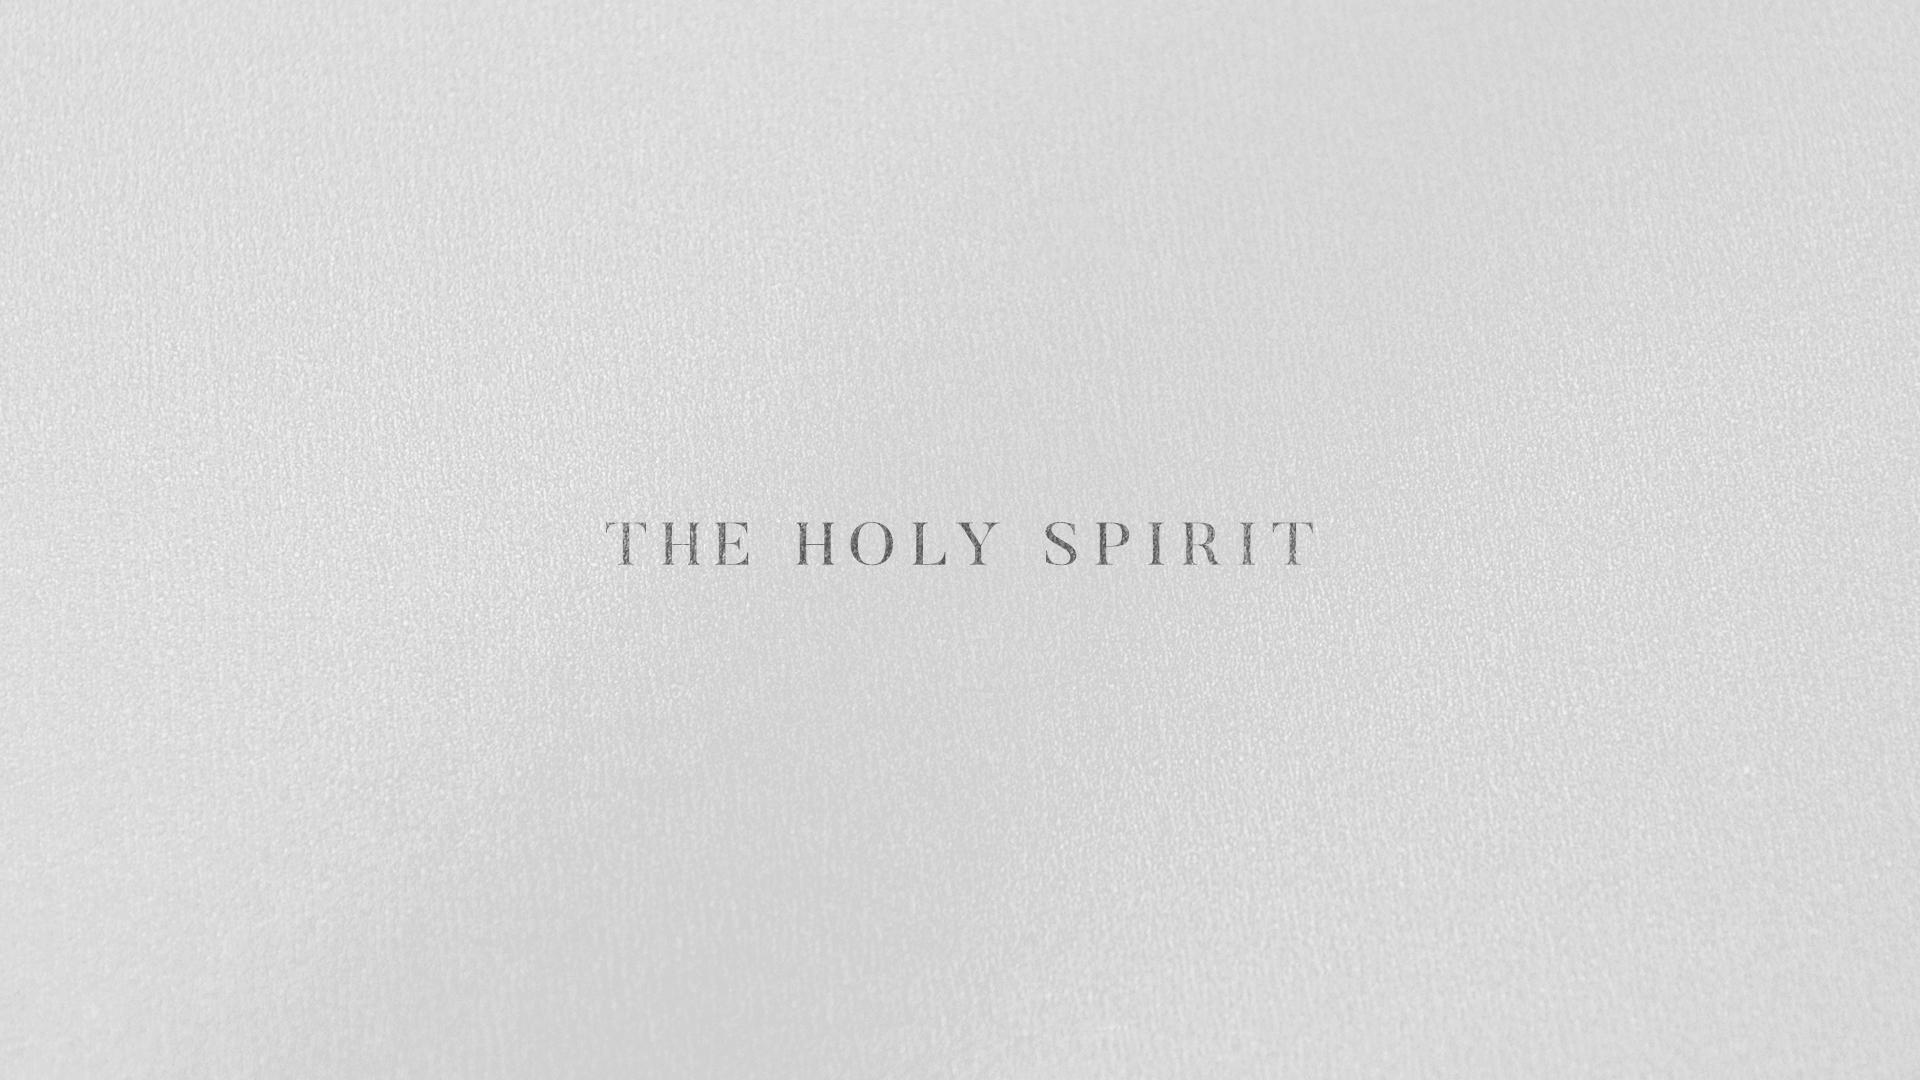 The Holy Spirit - Week 2 - David Hoffbrand